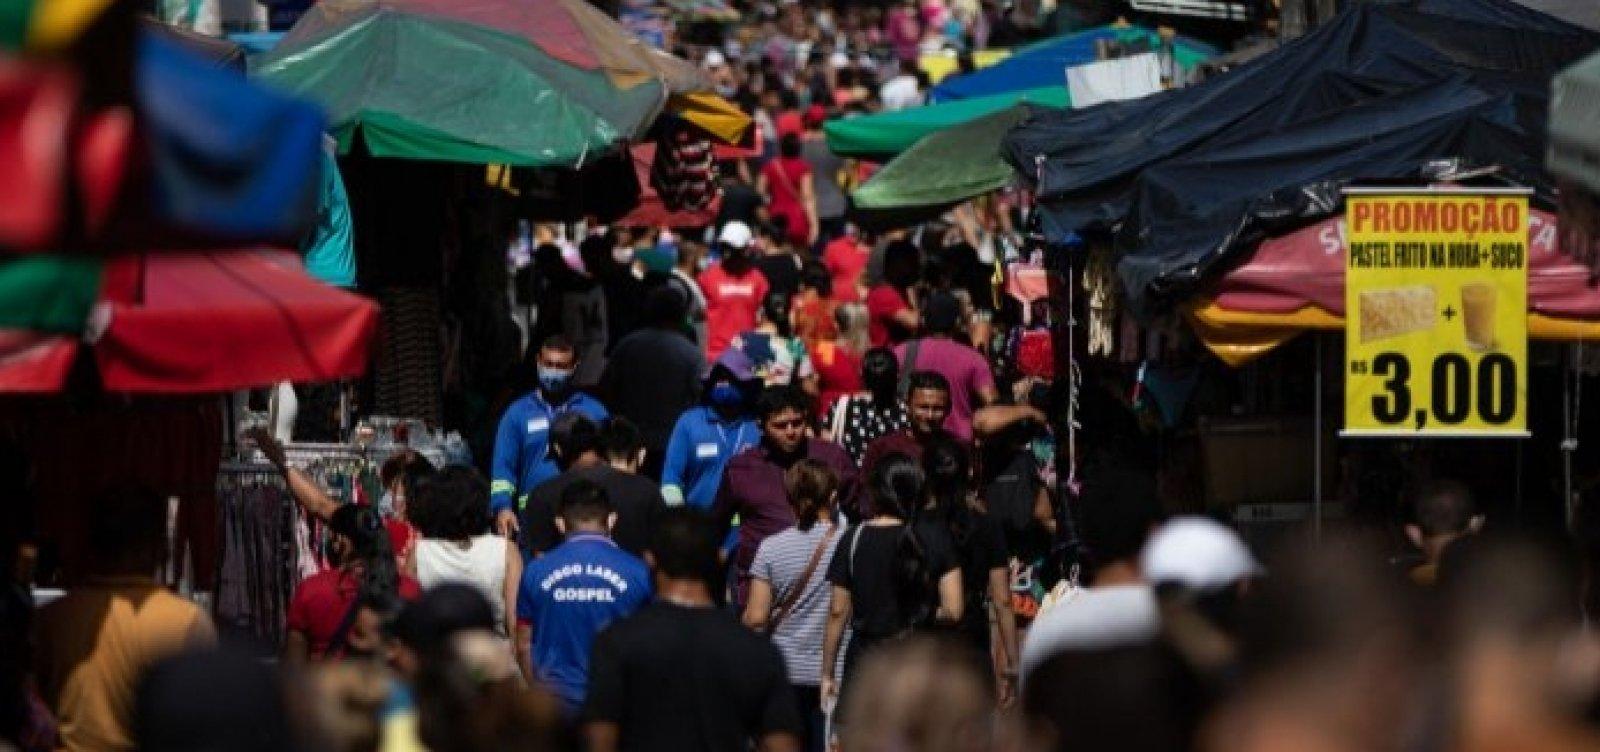 Brasil ultrapassa marca de 5 milhões de casos de coronavírus